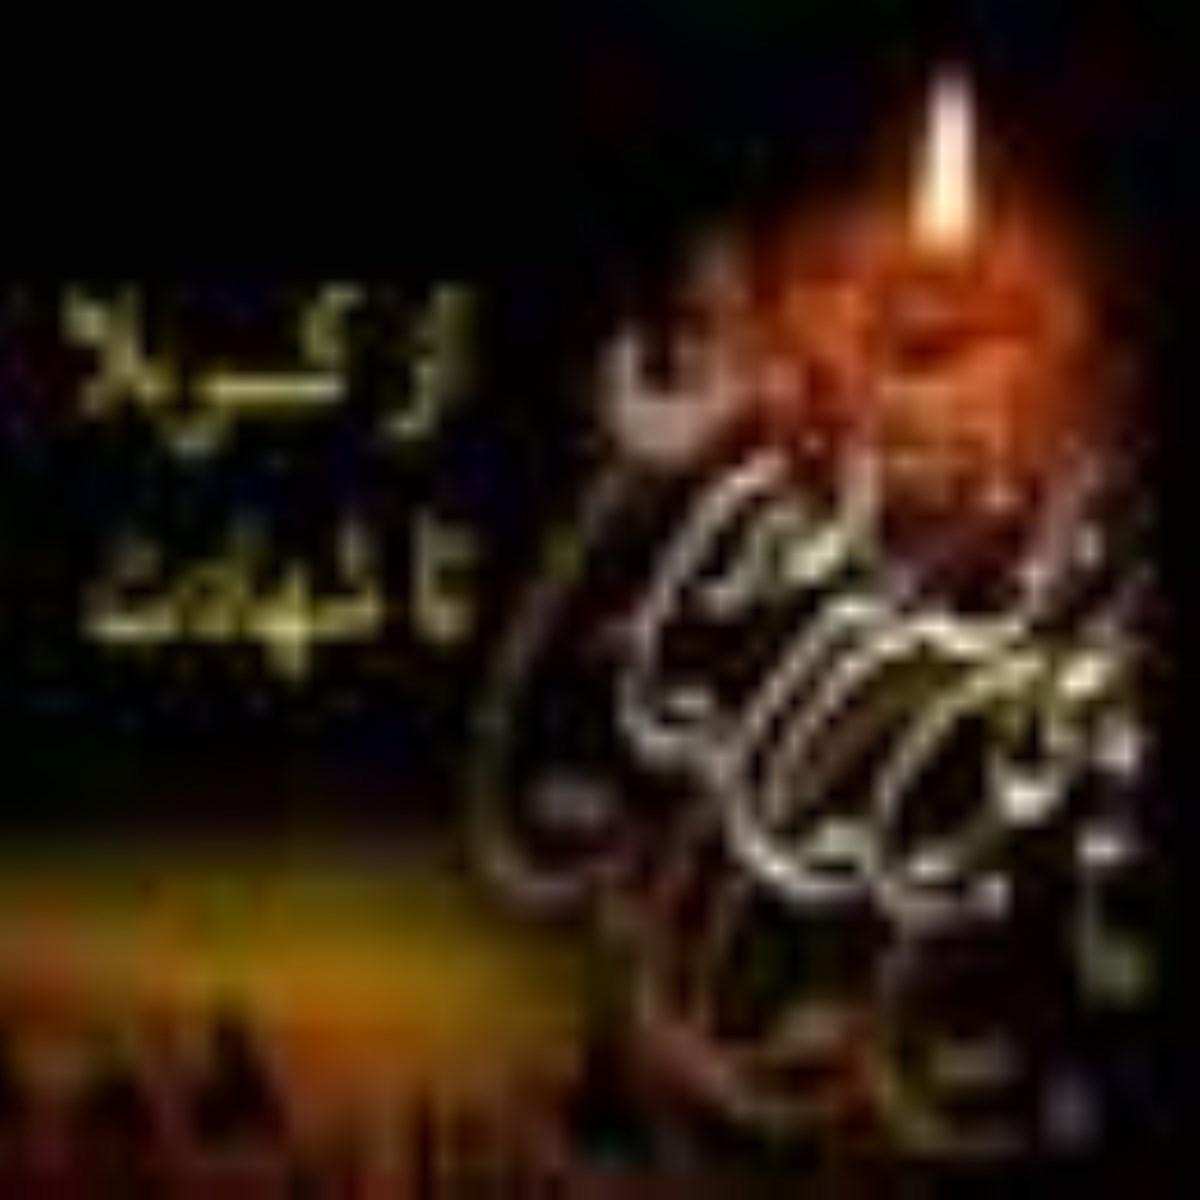 امام سجاد علیه السلام از کربلا تا شهادت